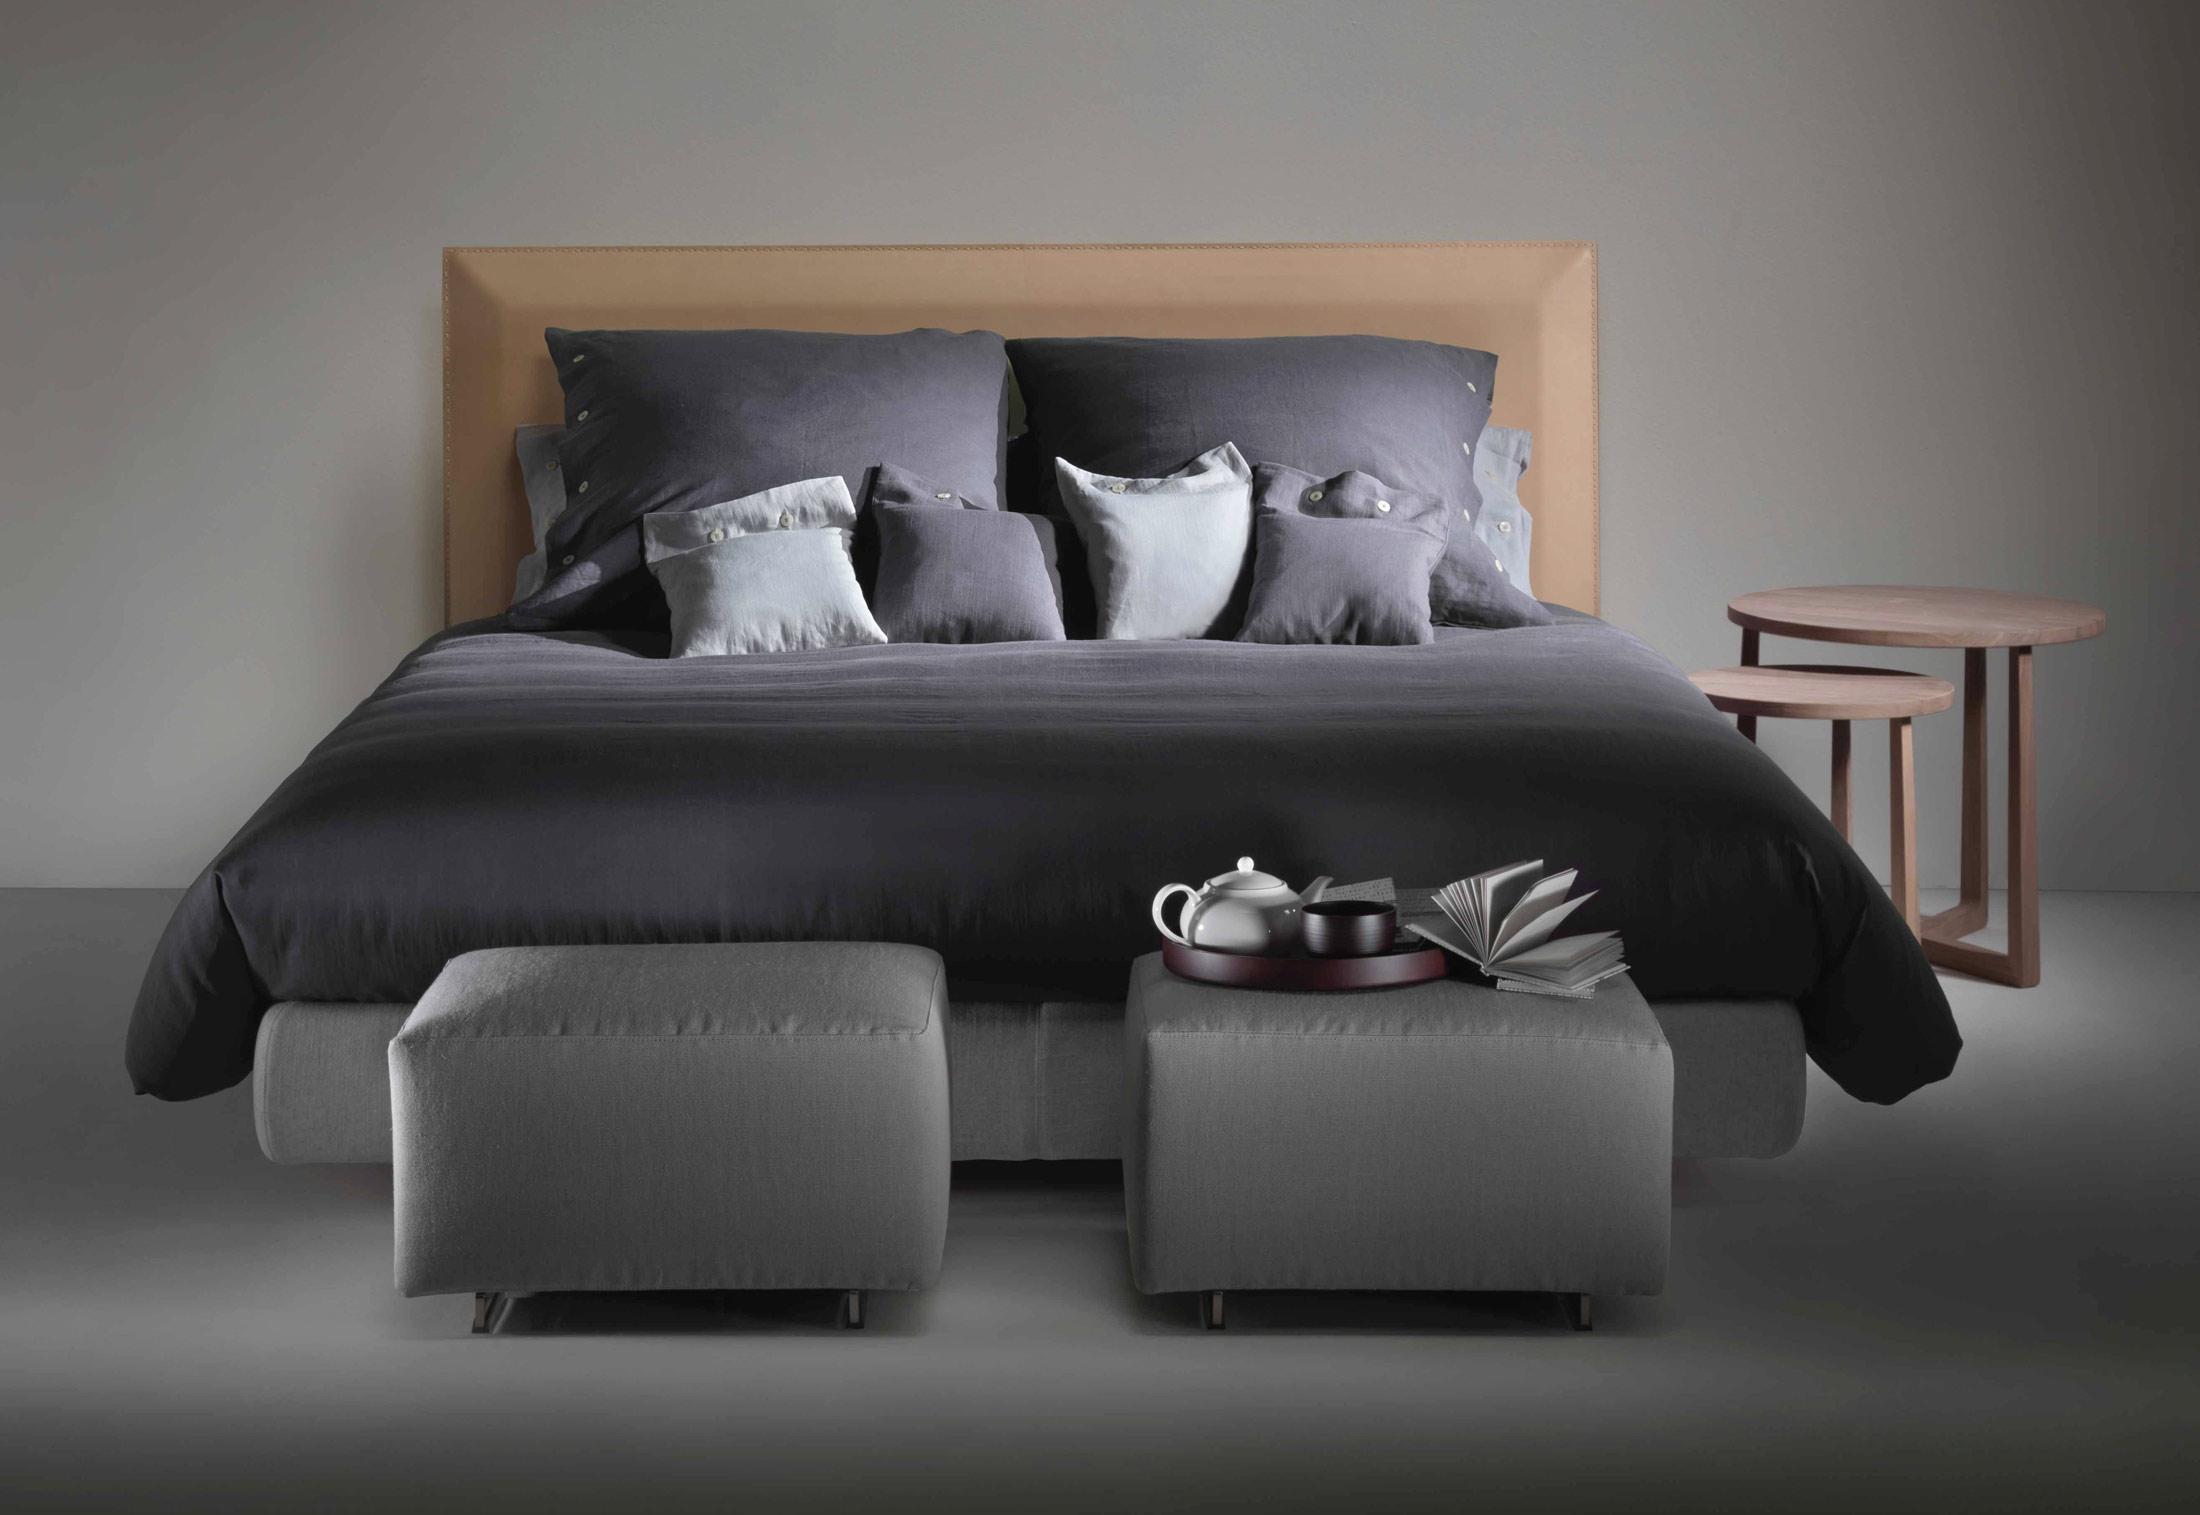 Remarkable Eden Bed By Flexform Stylepark Pdpeps Interior Chair Design Pdpepsorg